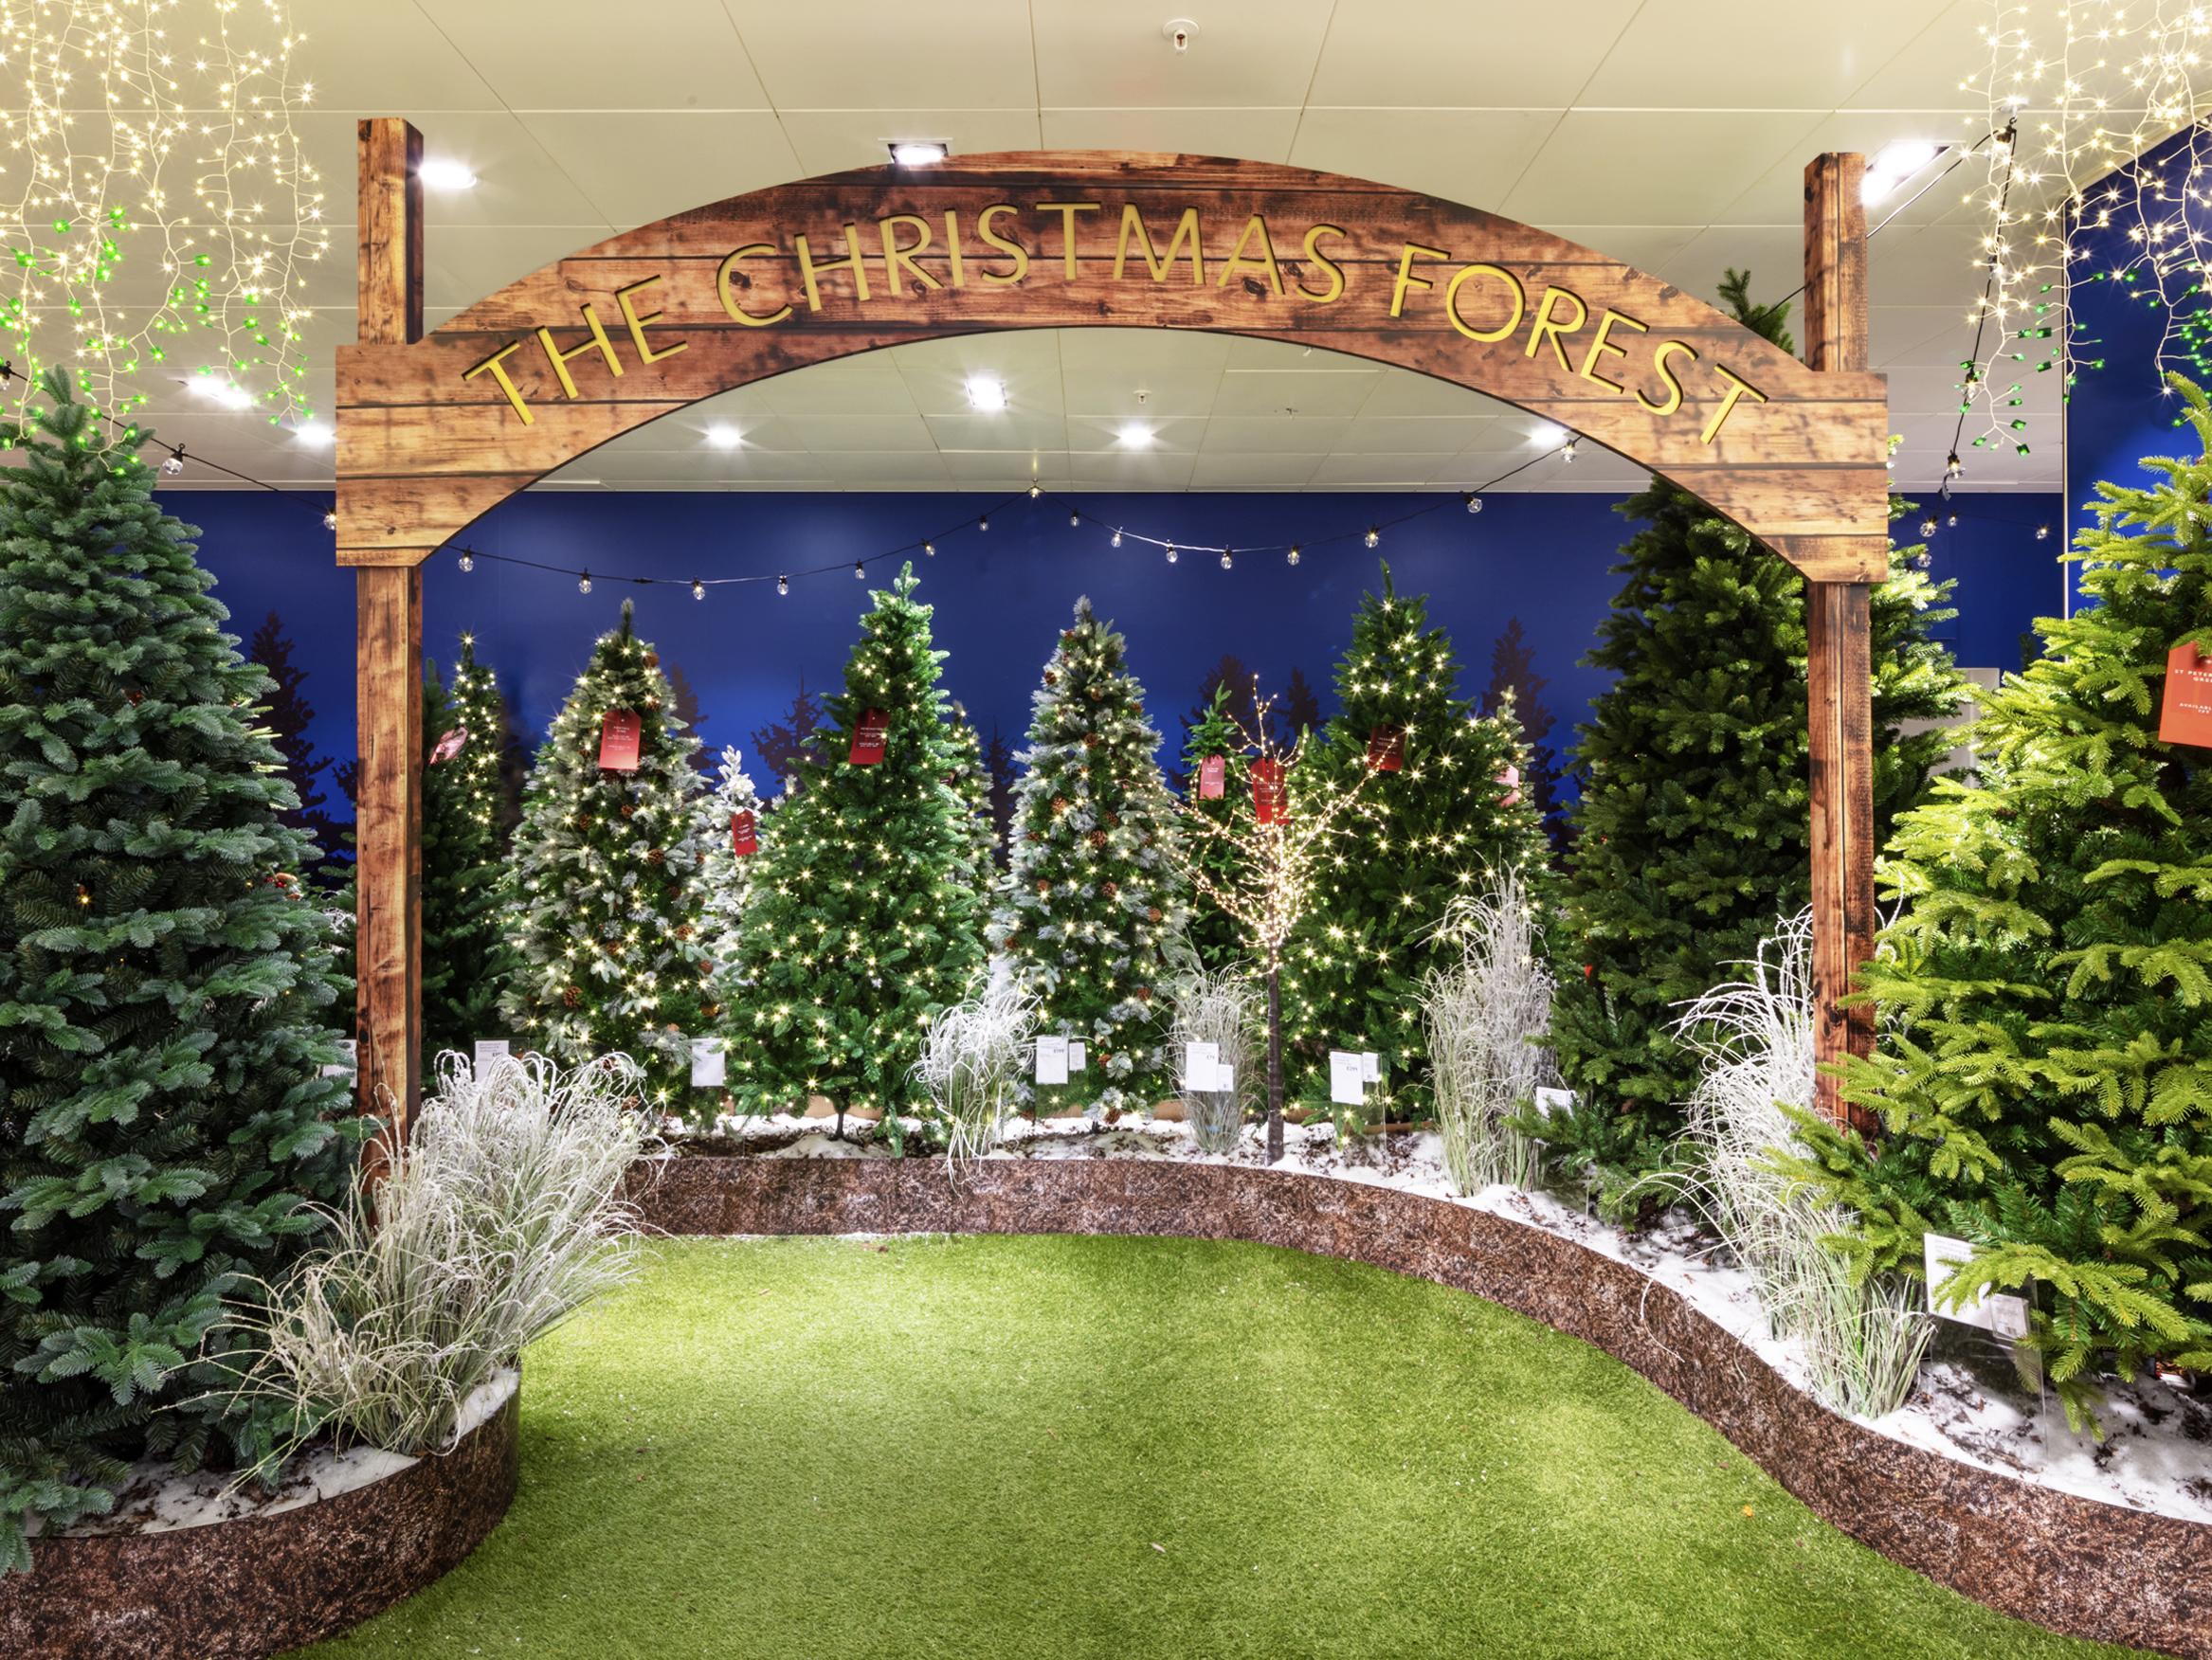 In-Store Christmas Display 10 | Prop Studios | Formroom | John Lewis Christmas